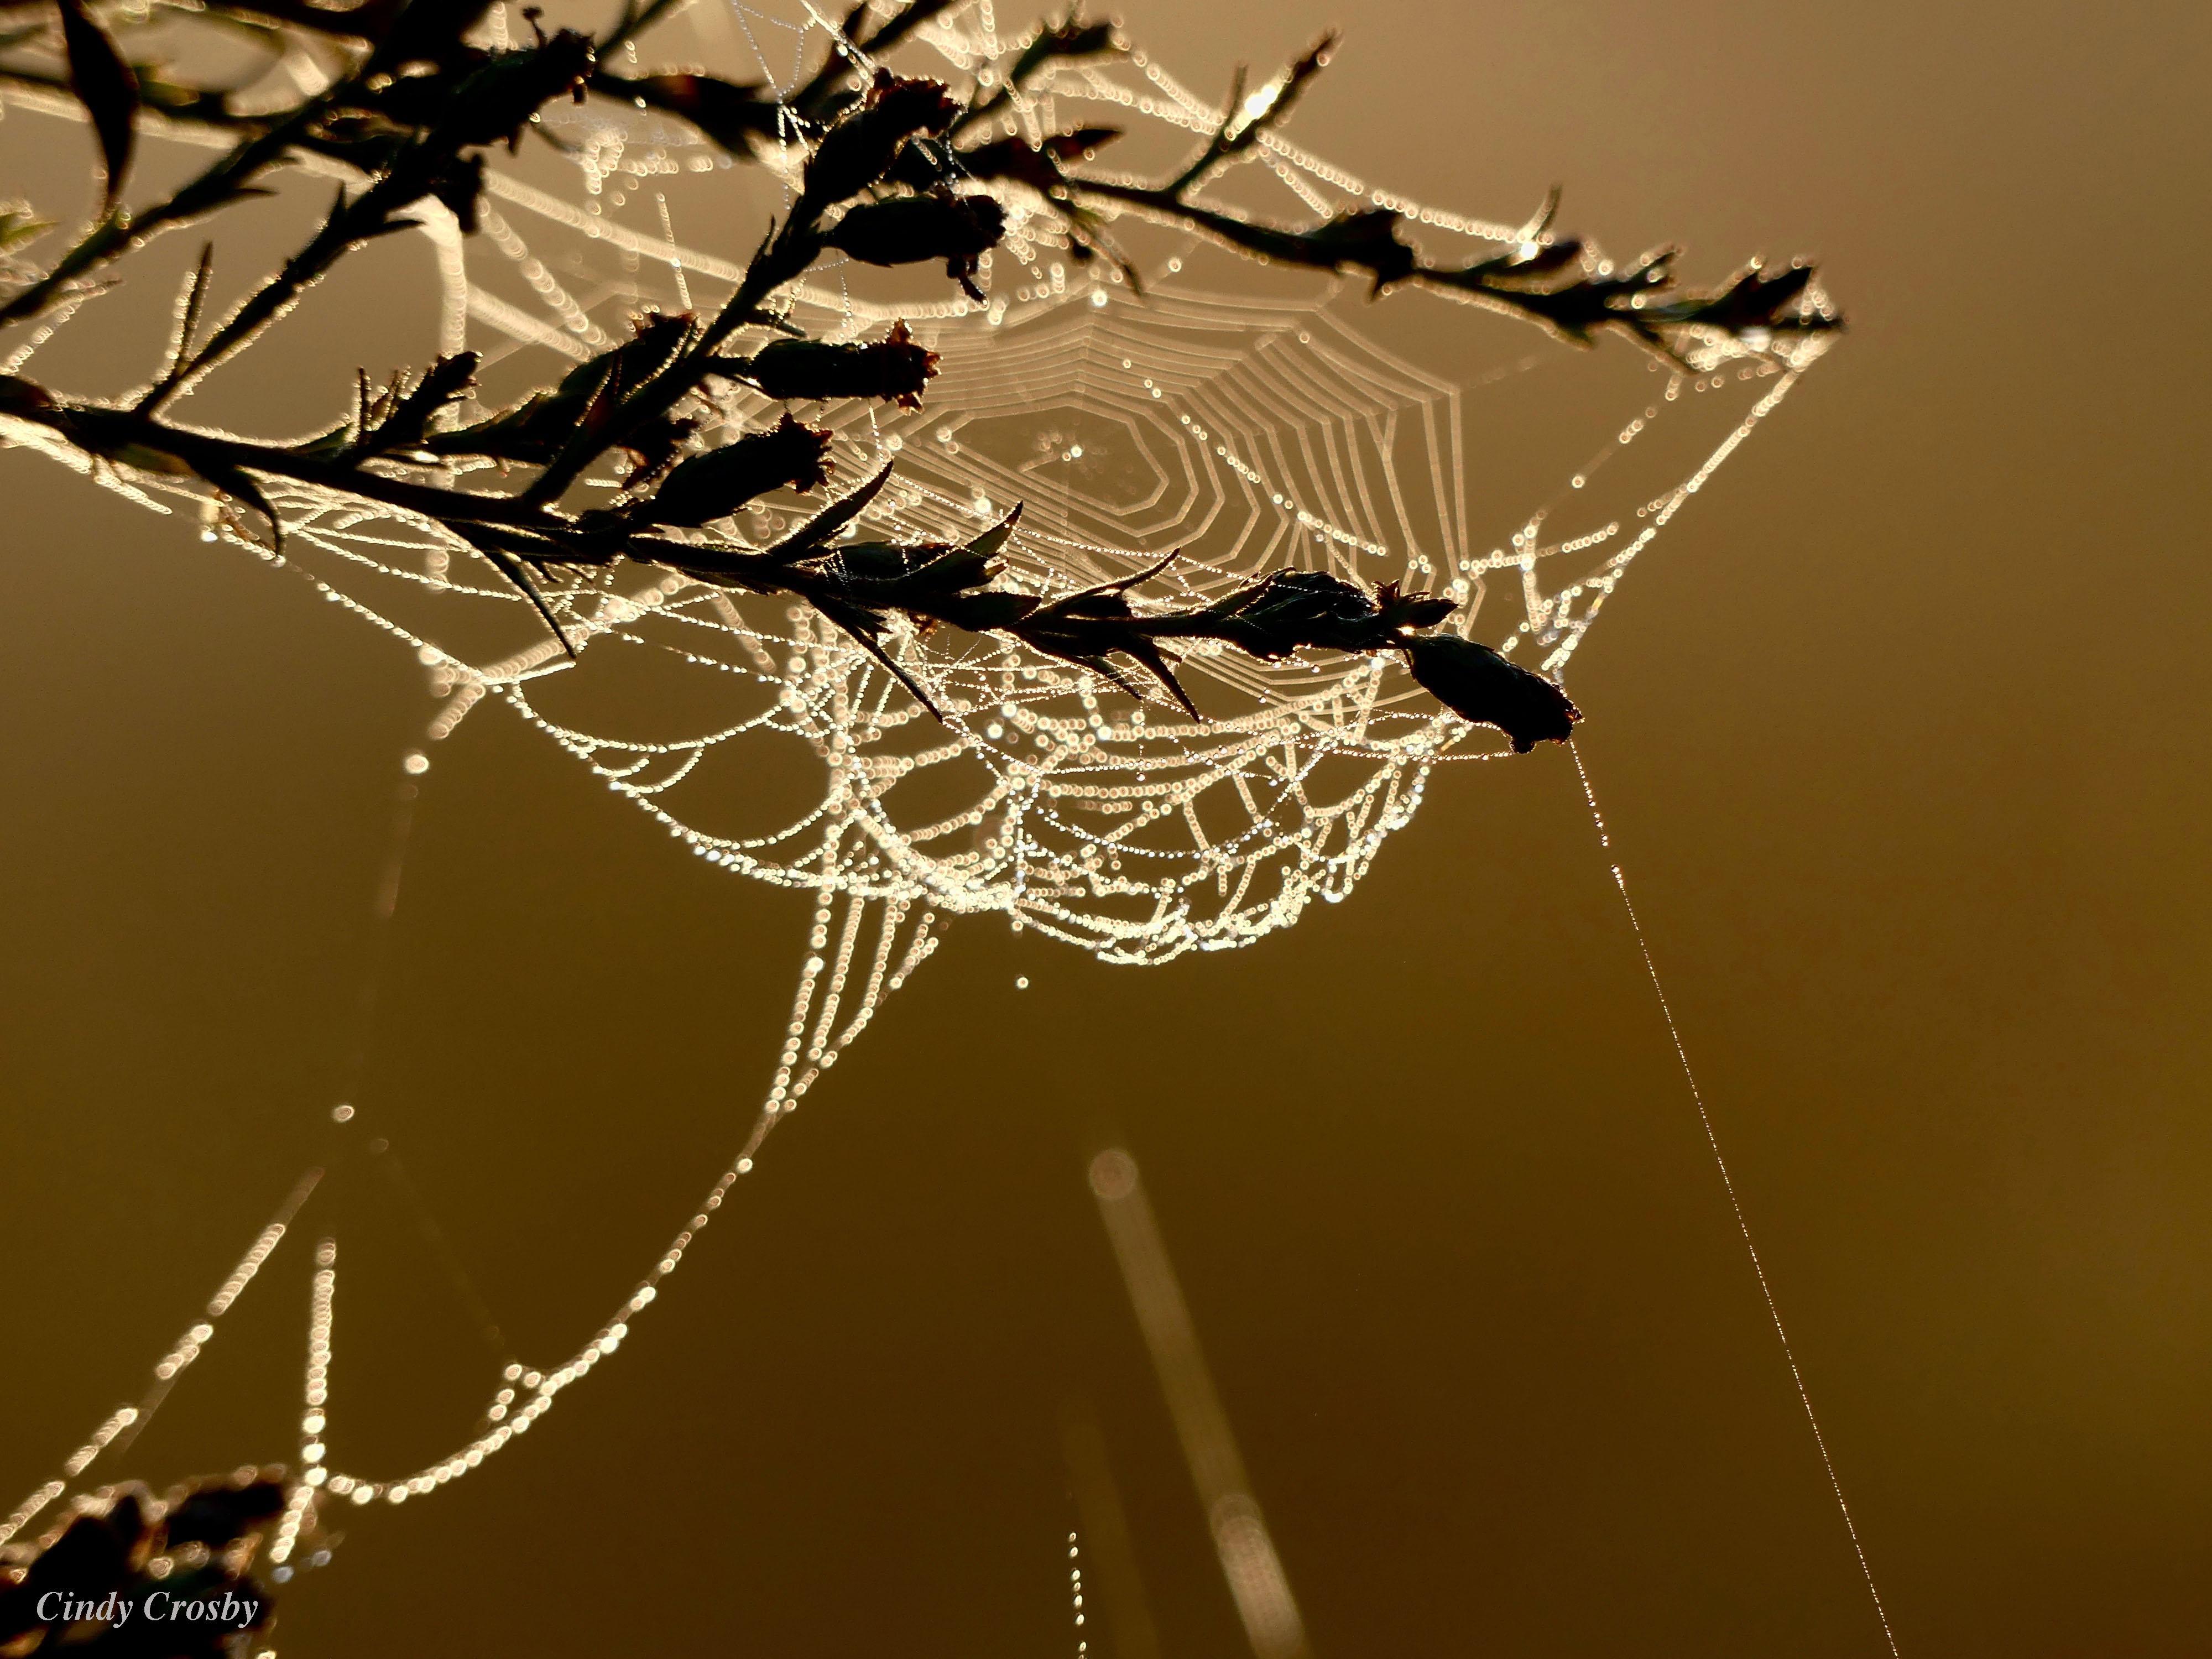 spiderwebdewfogwestsideMA93019WM.jpg